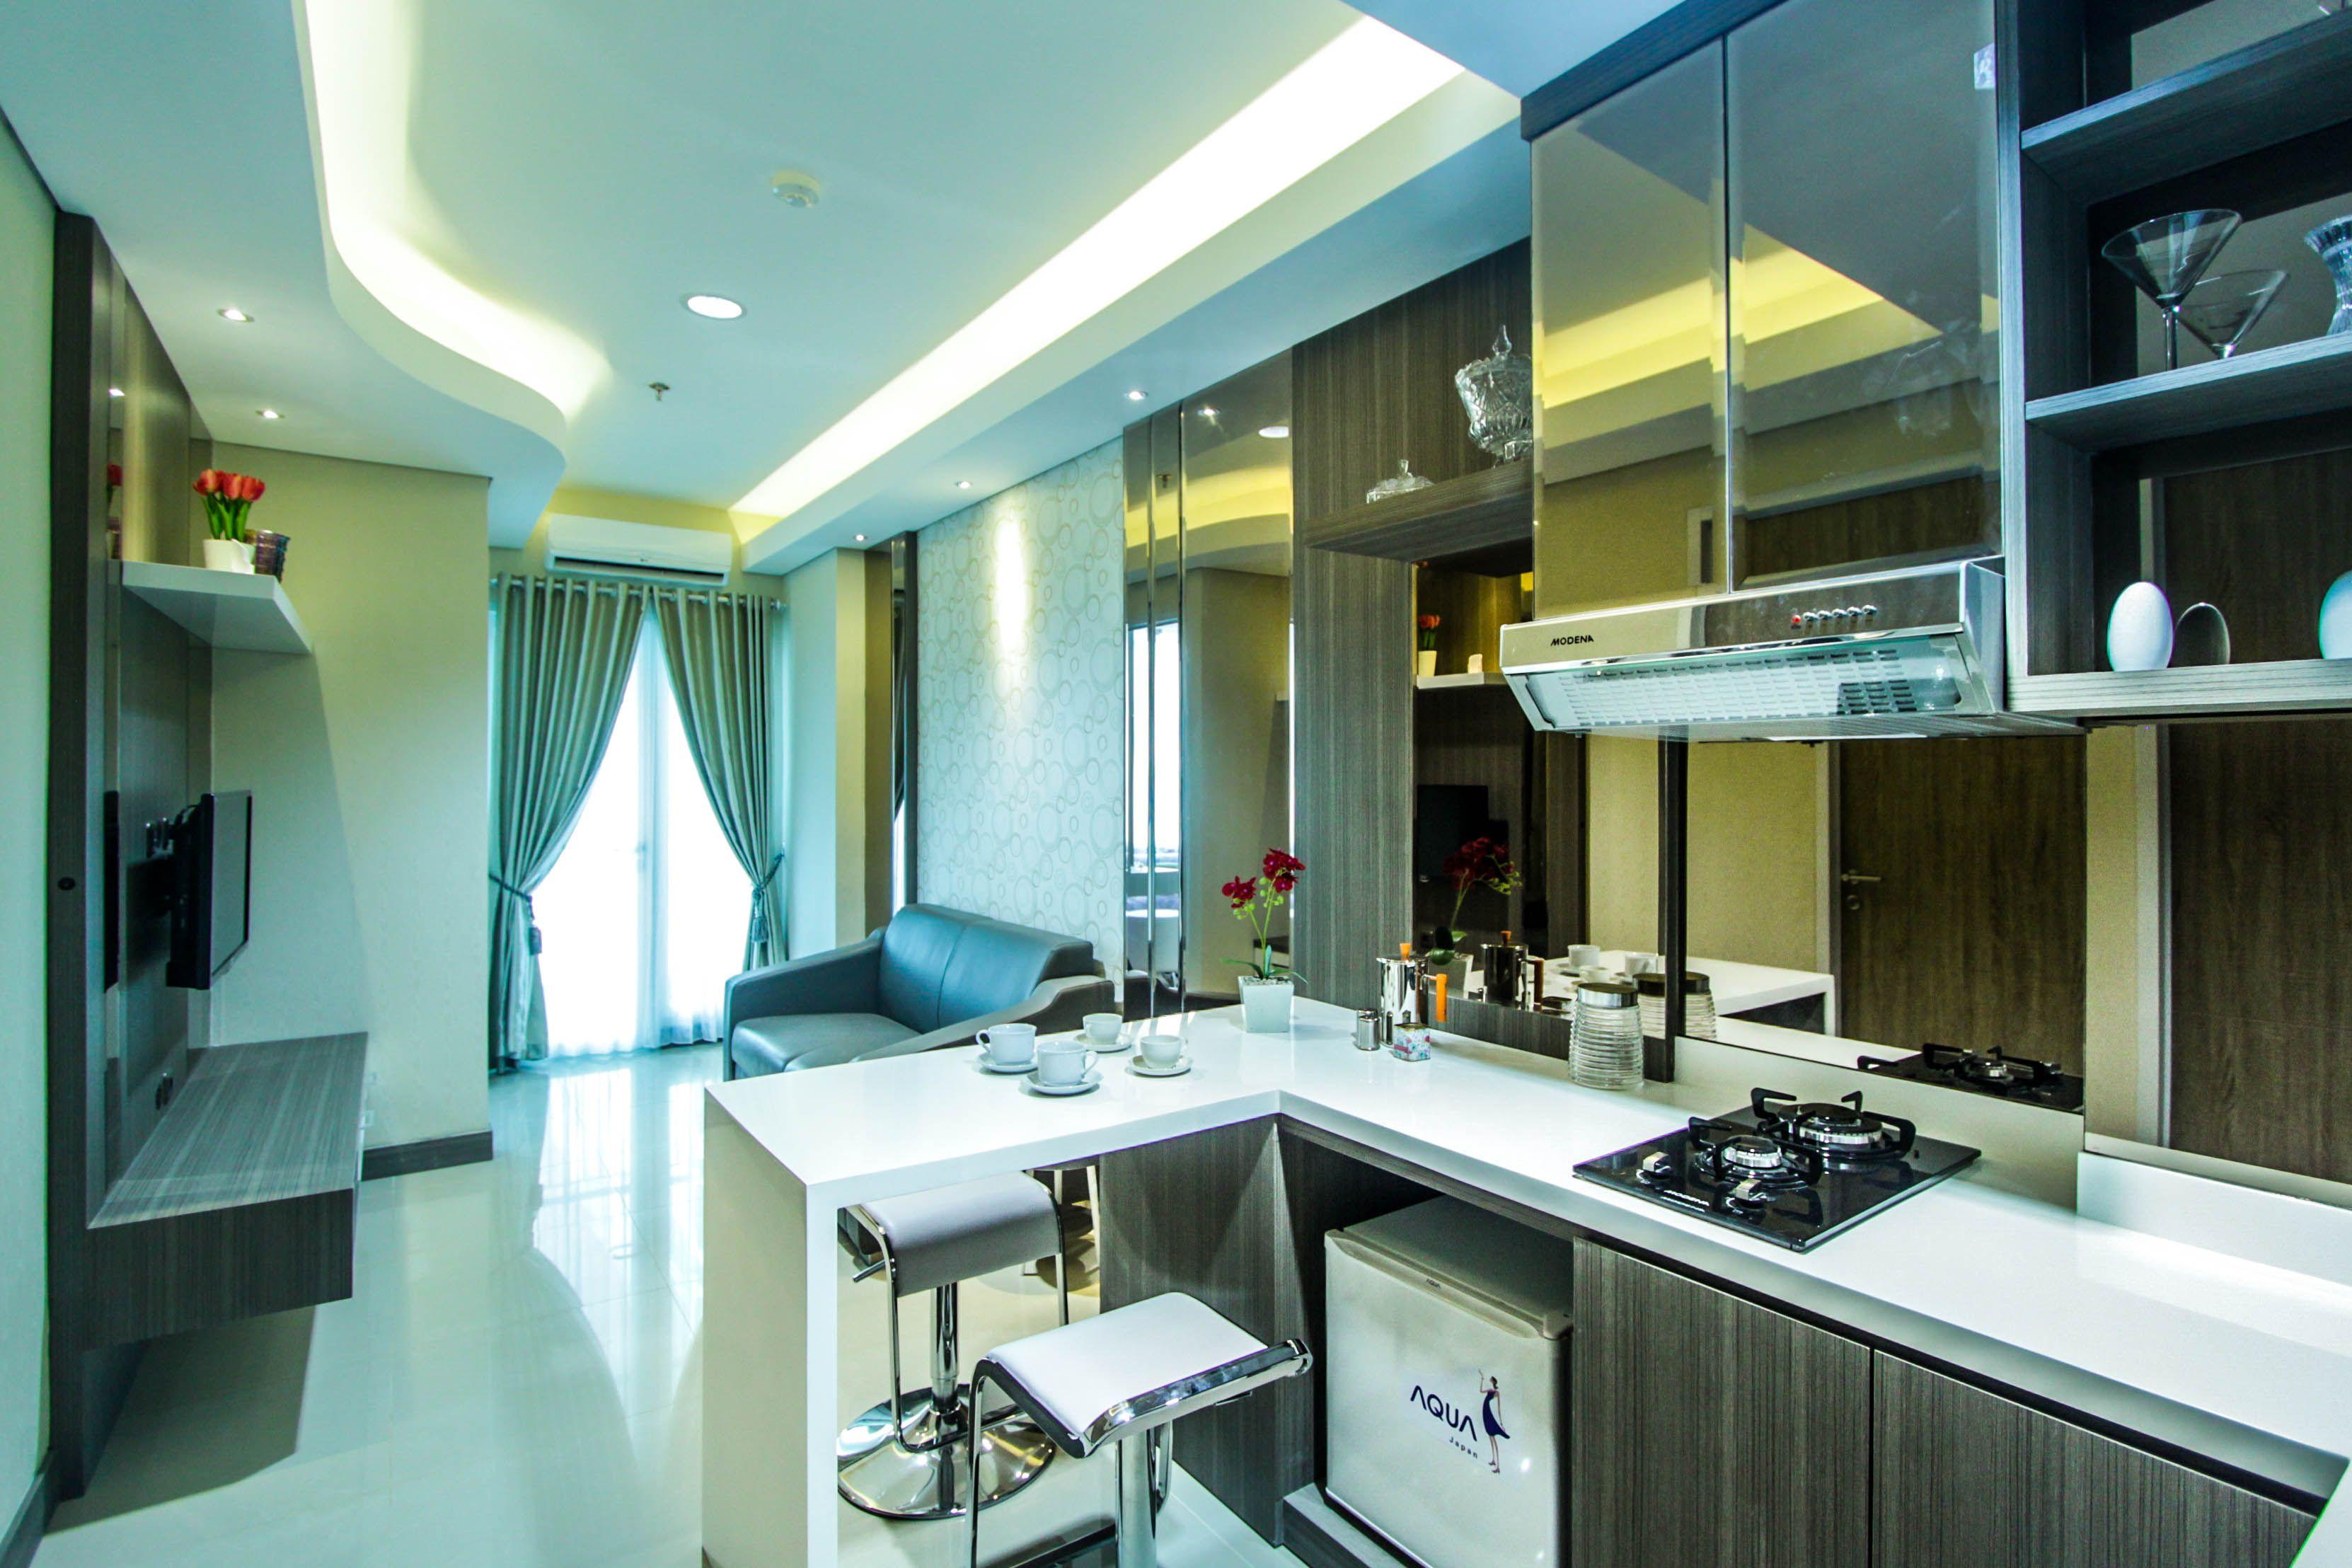 Pin by tamansari iswara apartment on show unit pinterest